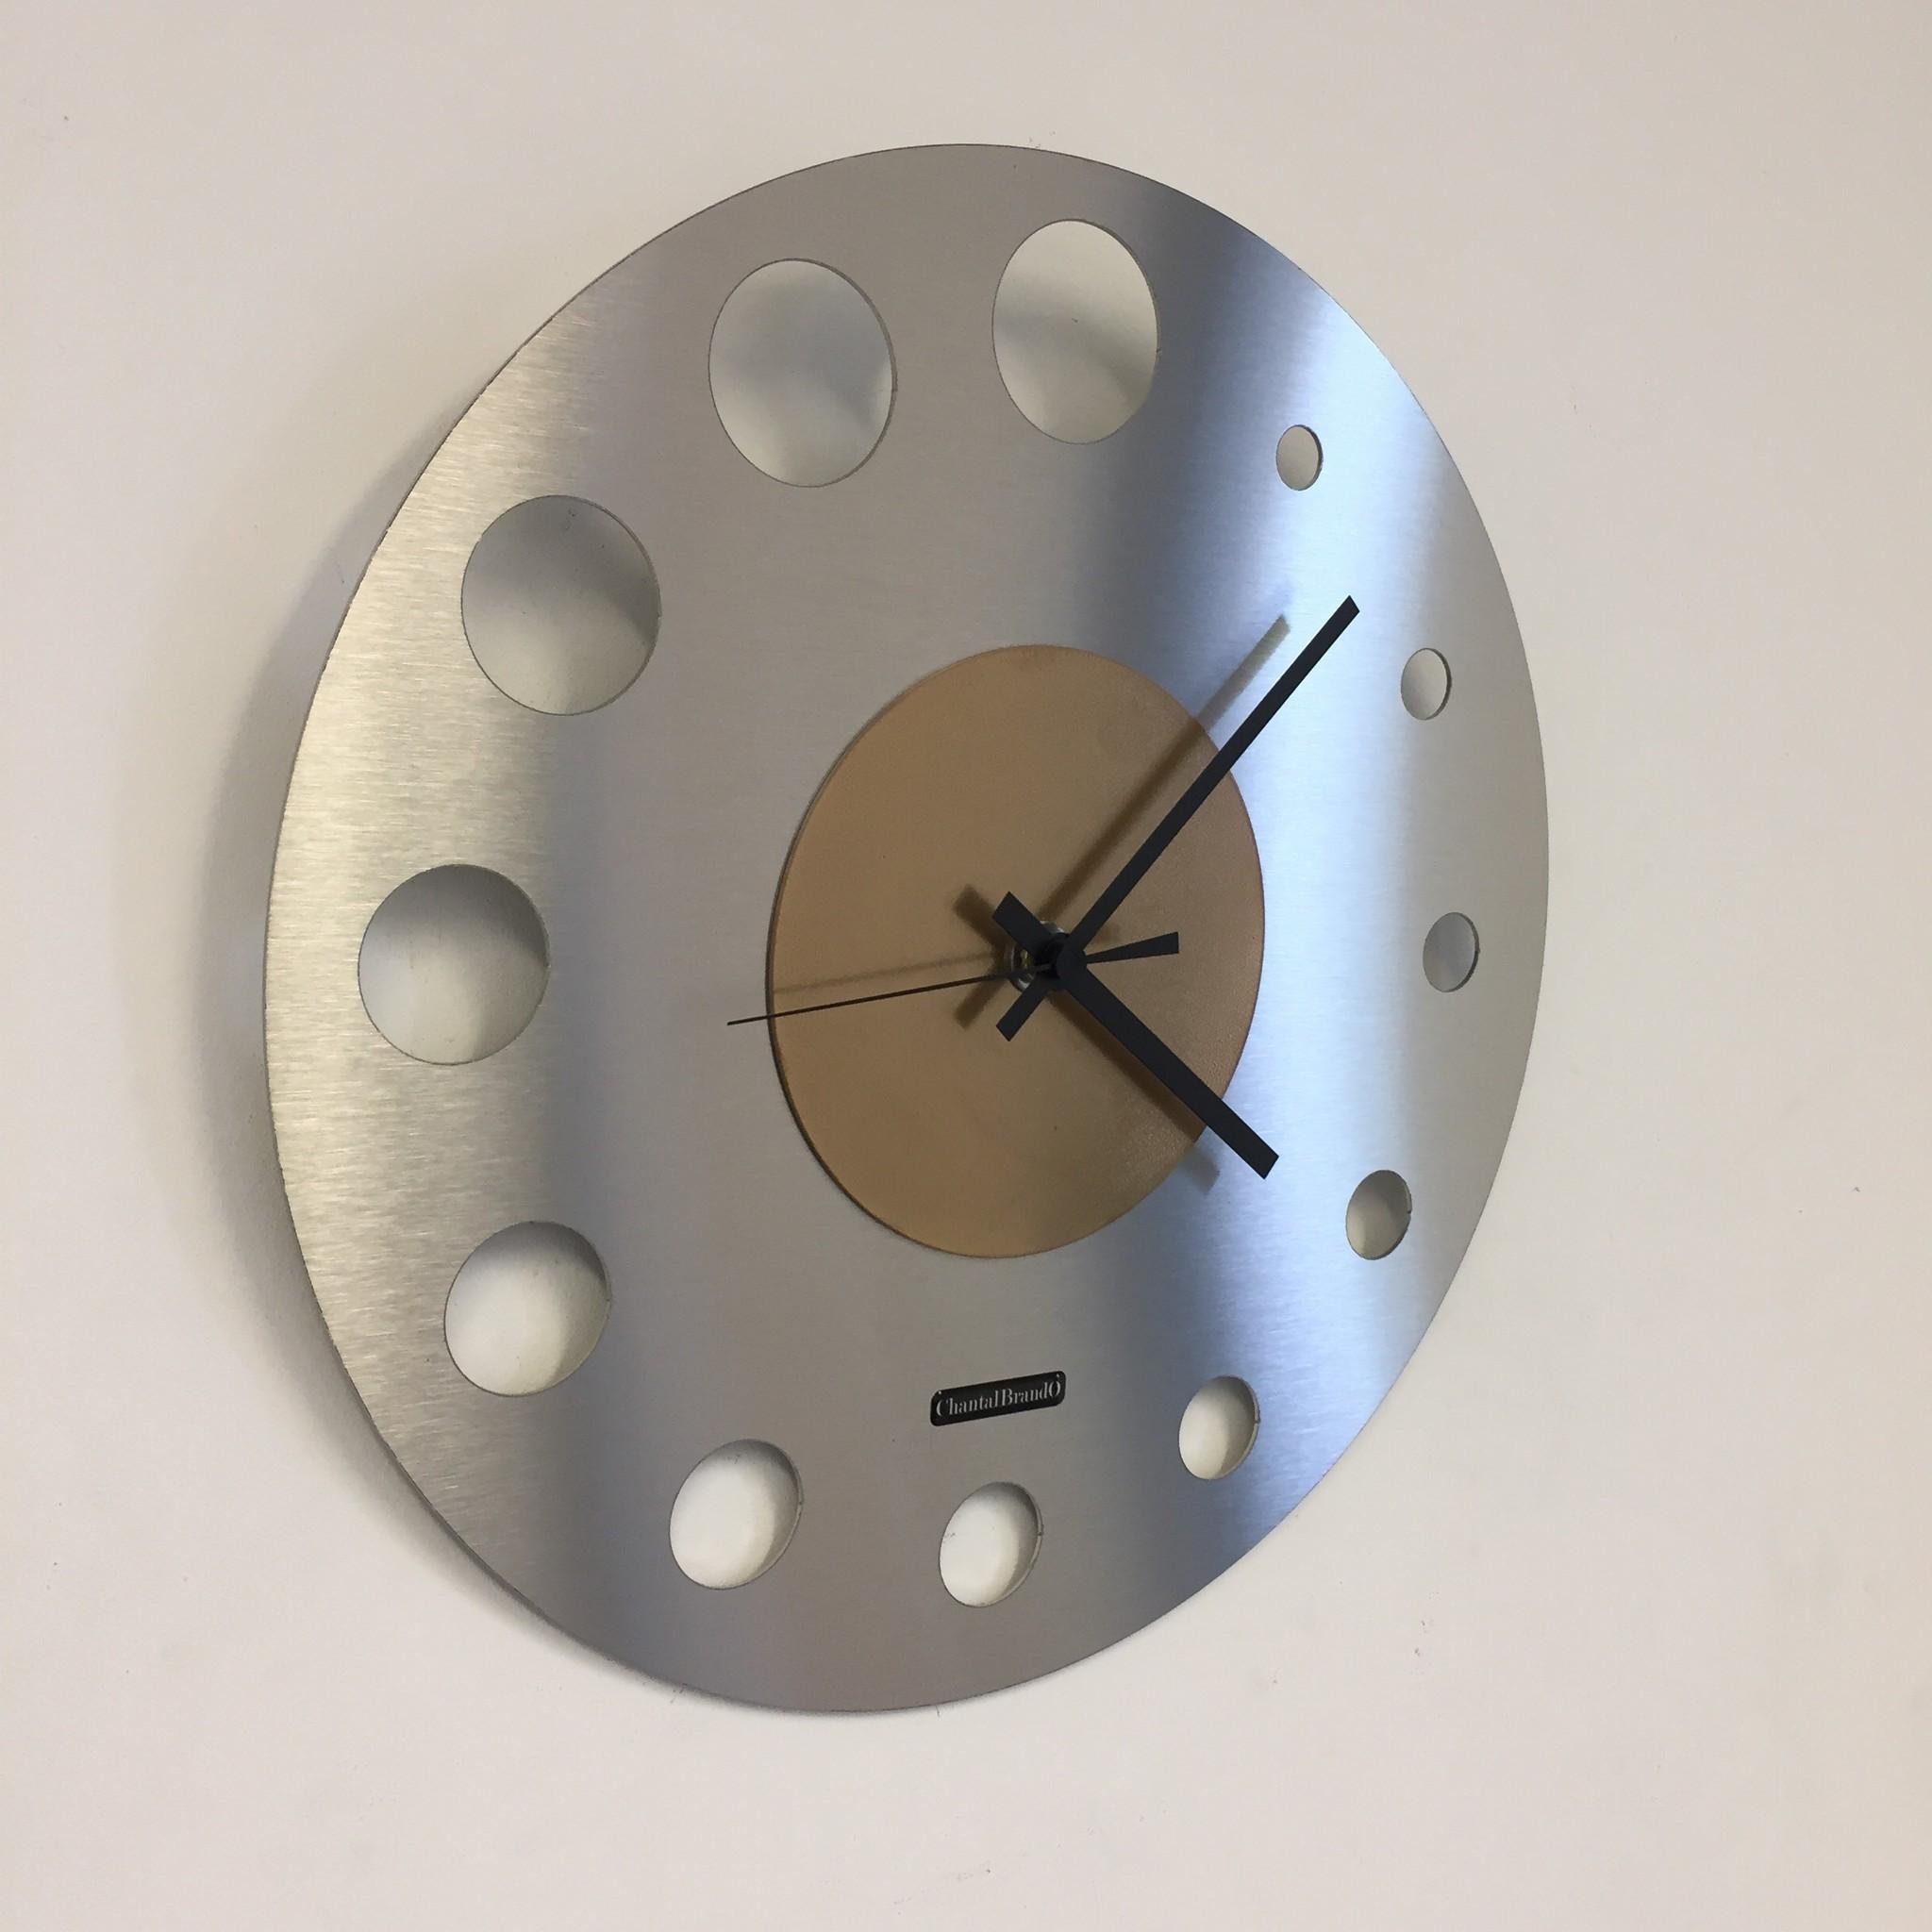 ChantalBrandO Wandklok JUNTE BRUSSEL ATOMIUM GOLD Modern Design